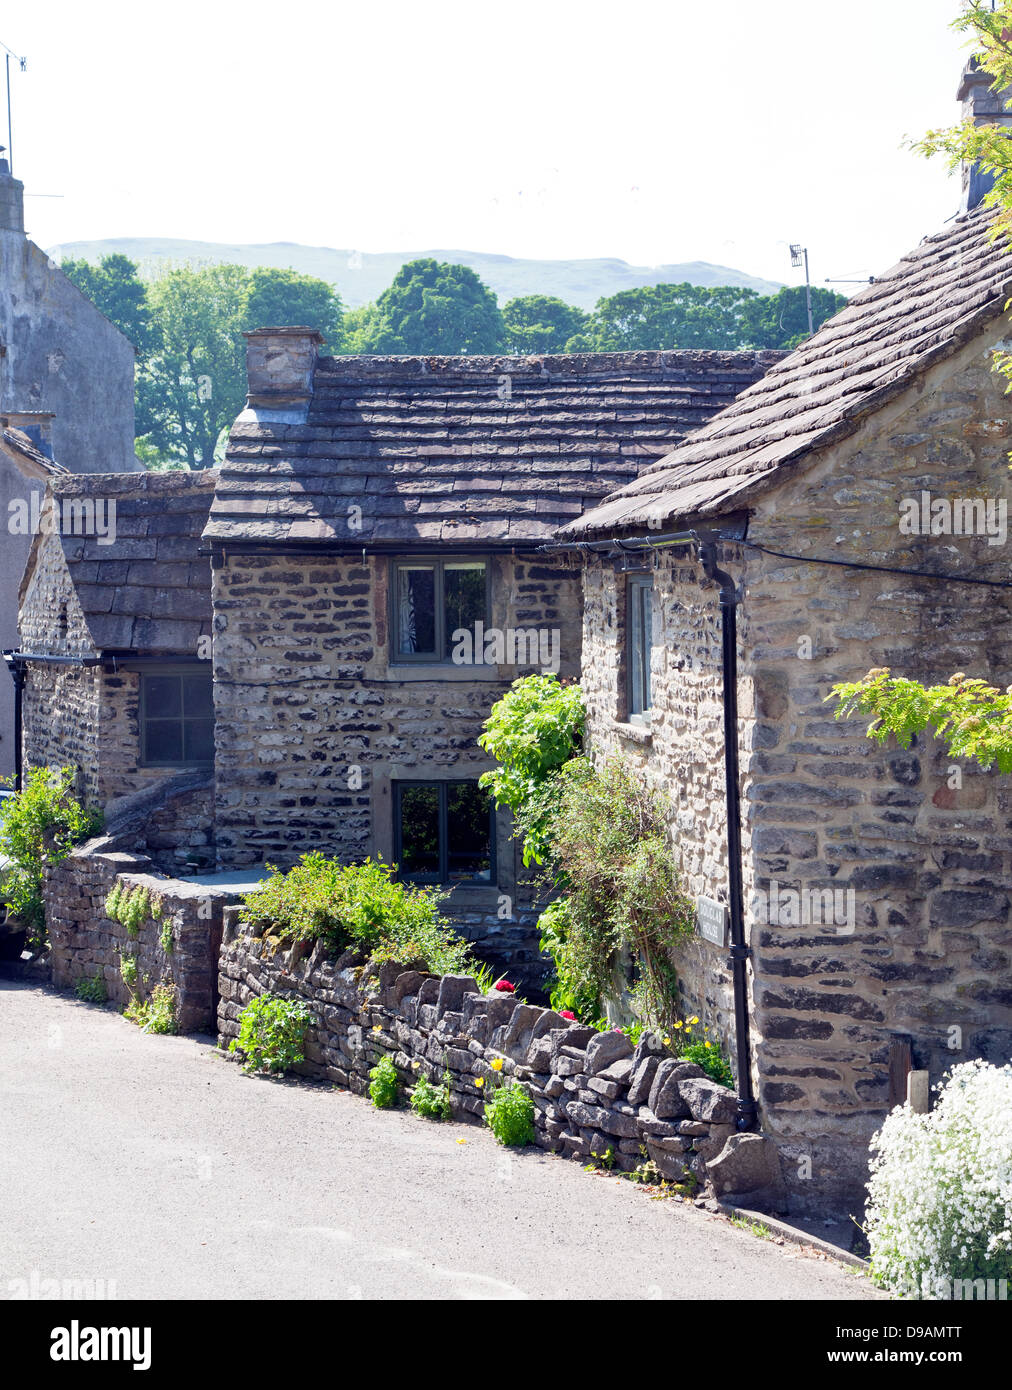 Local Architecture Castleton Peak District Derbyshire UK - Stock Image